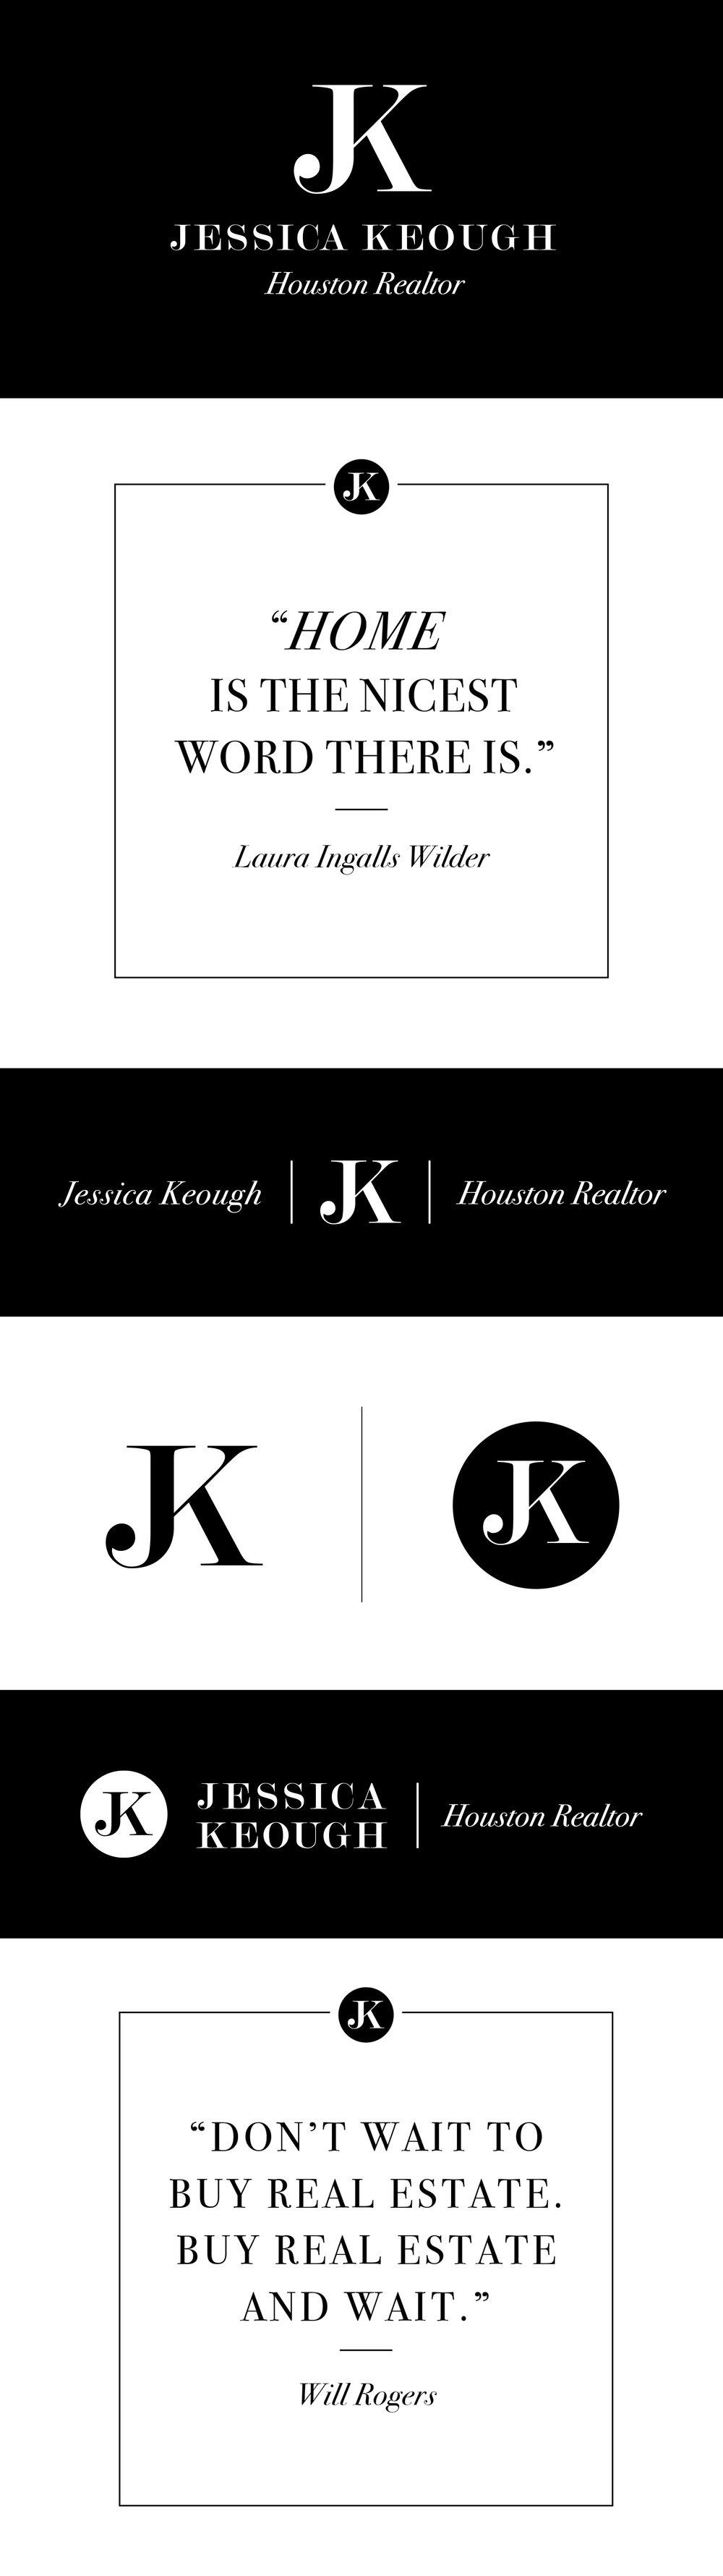 Jessica K Brand Board3.jpg